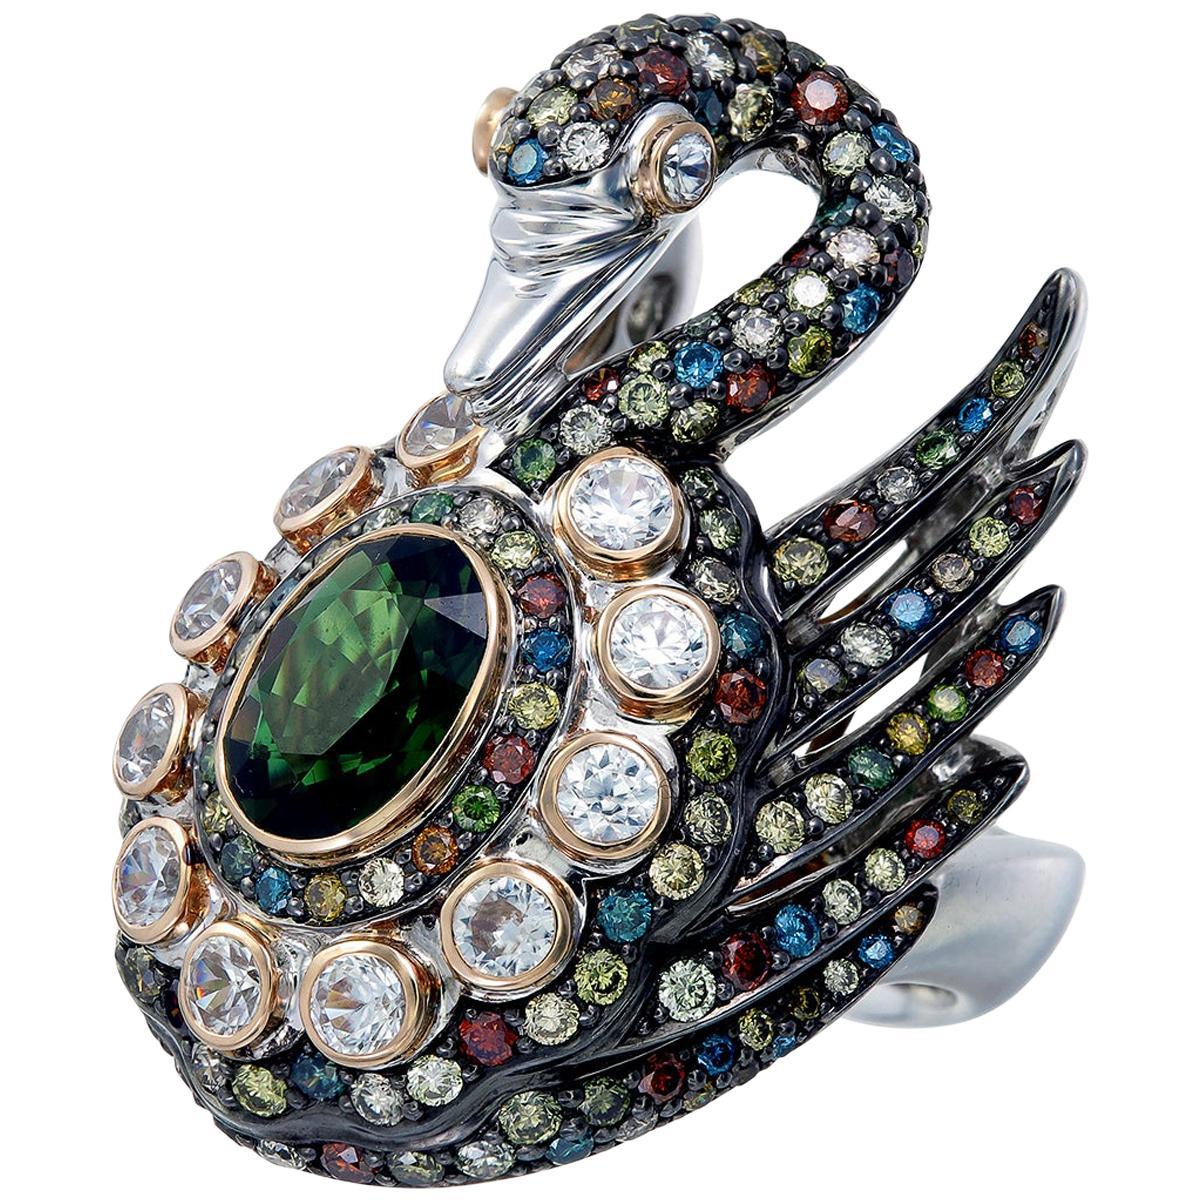 Zorab Creation Multicolored Diamond the Sparkling Swan Ring